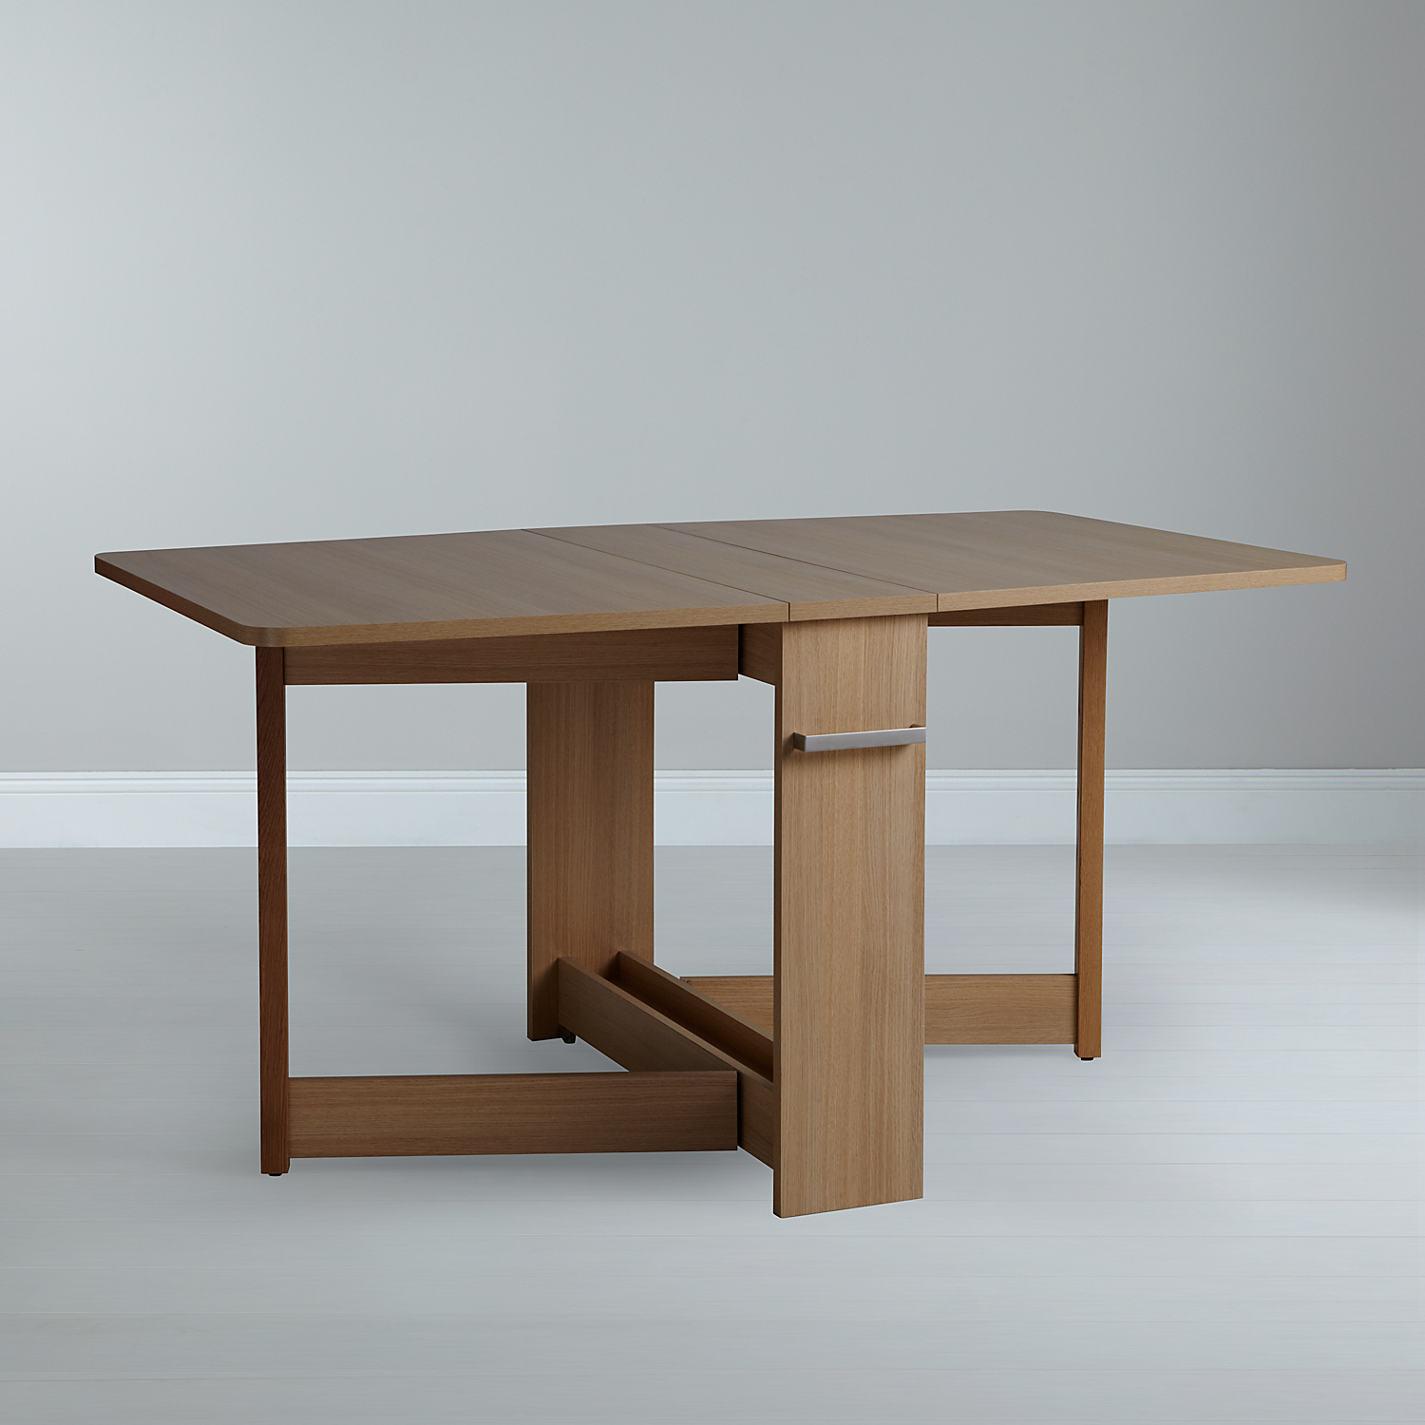 Fold Up Dining Room Tables Buy Leonhard Pfeifer For John Lewis Croyde 6 Seater Drop Leaf